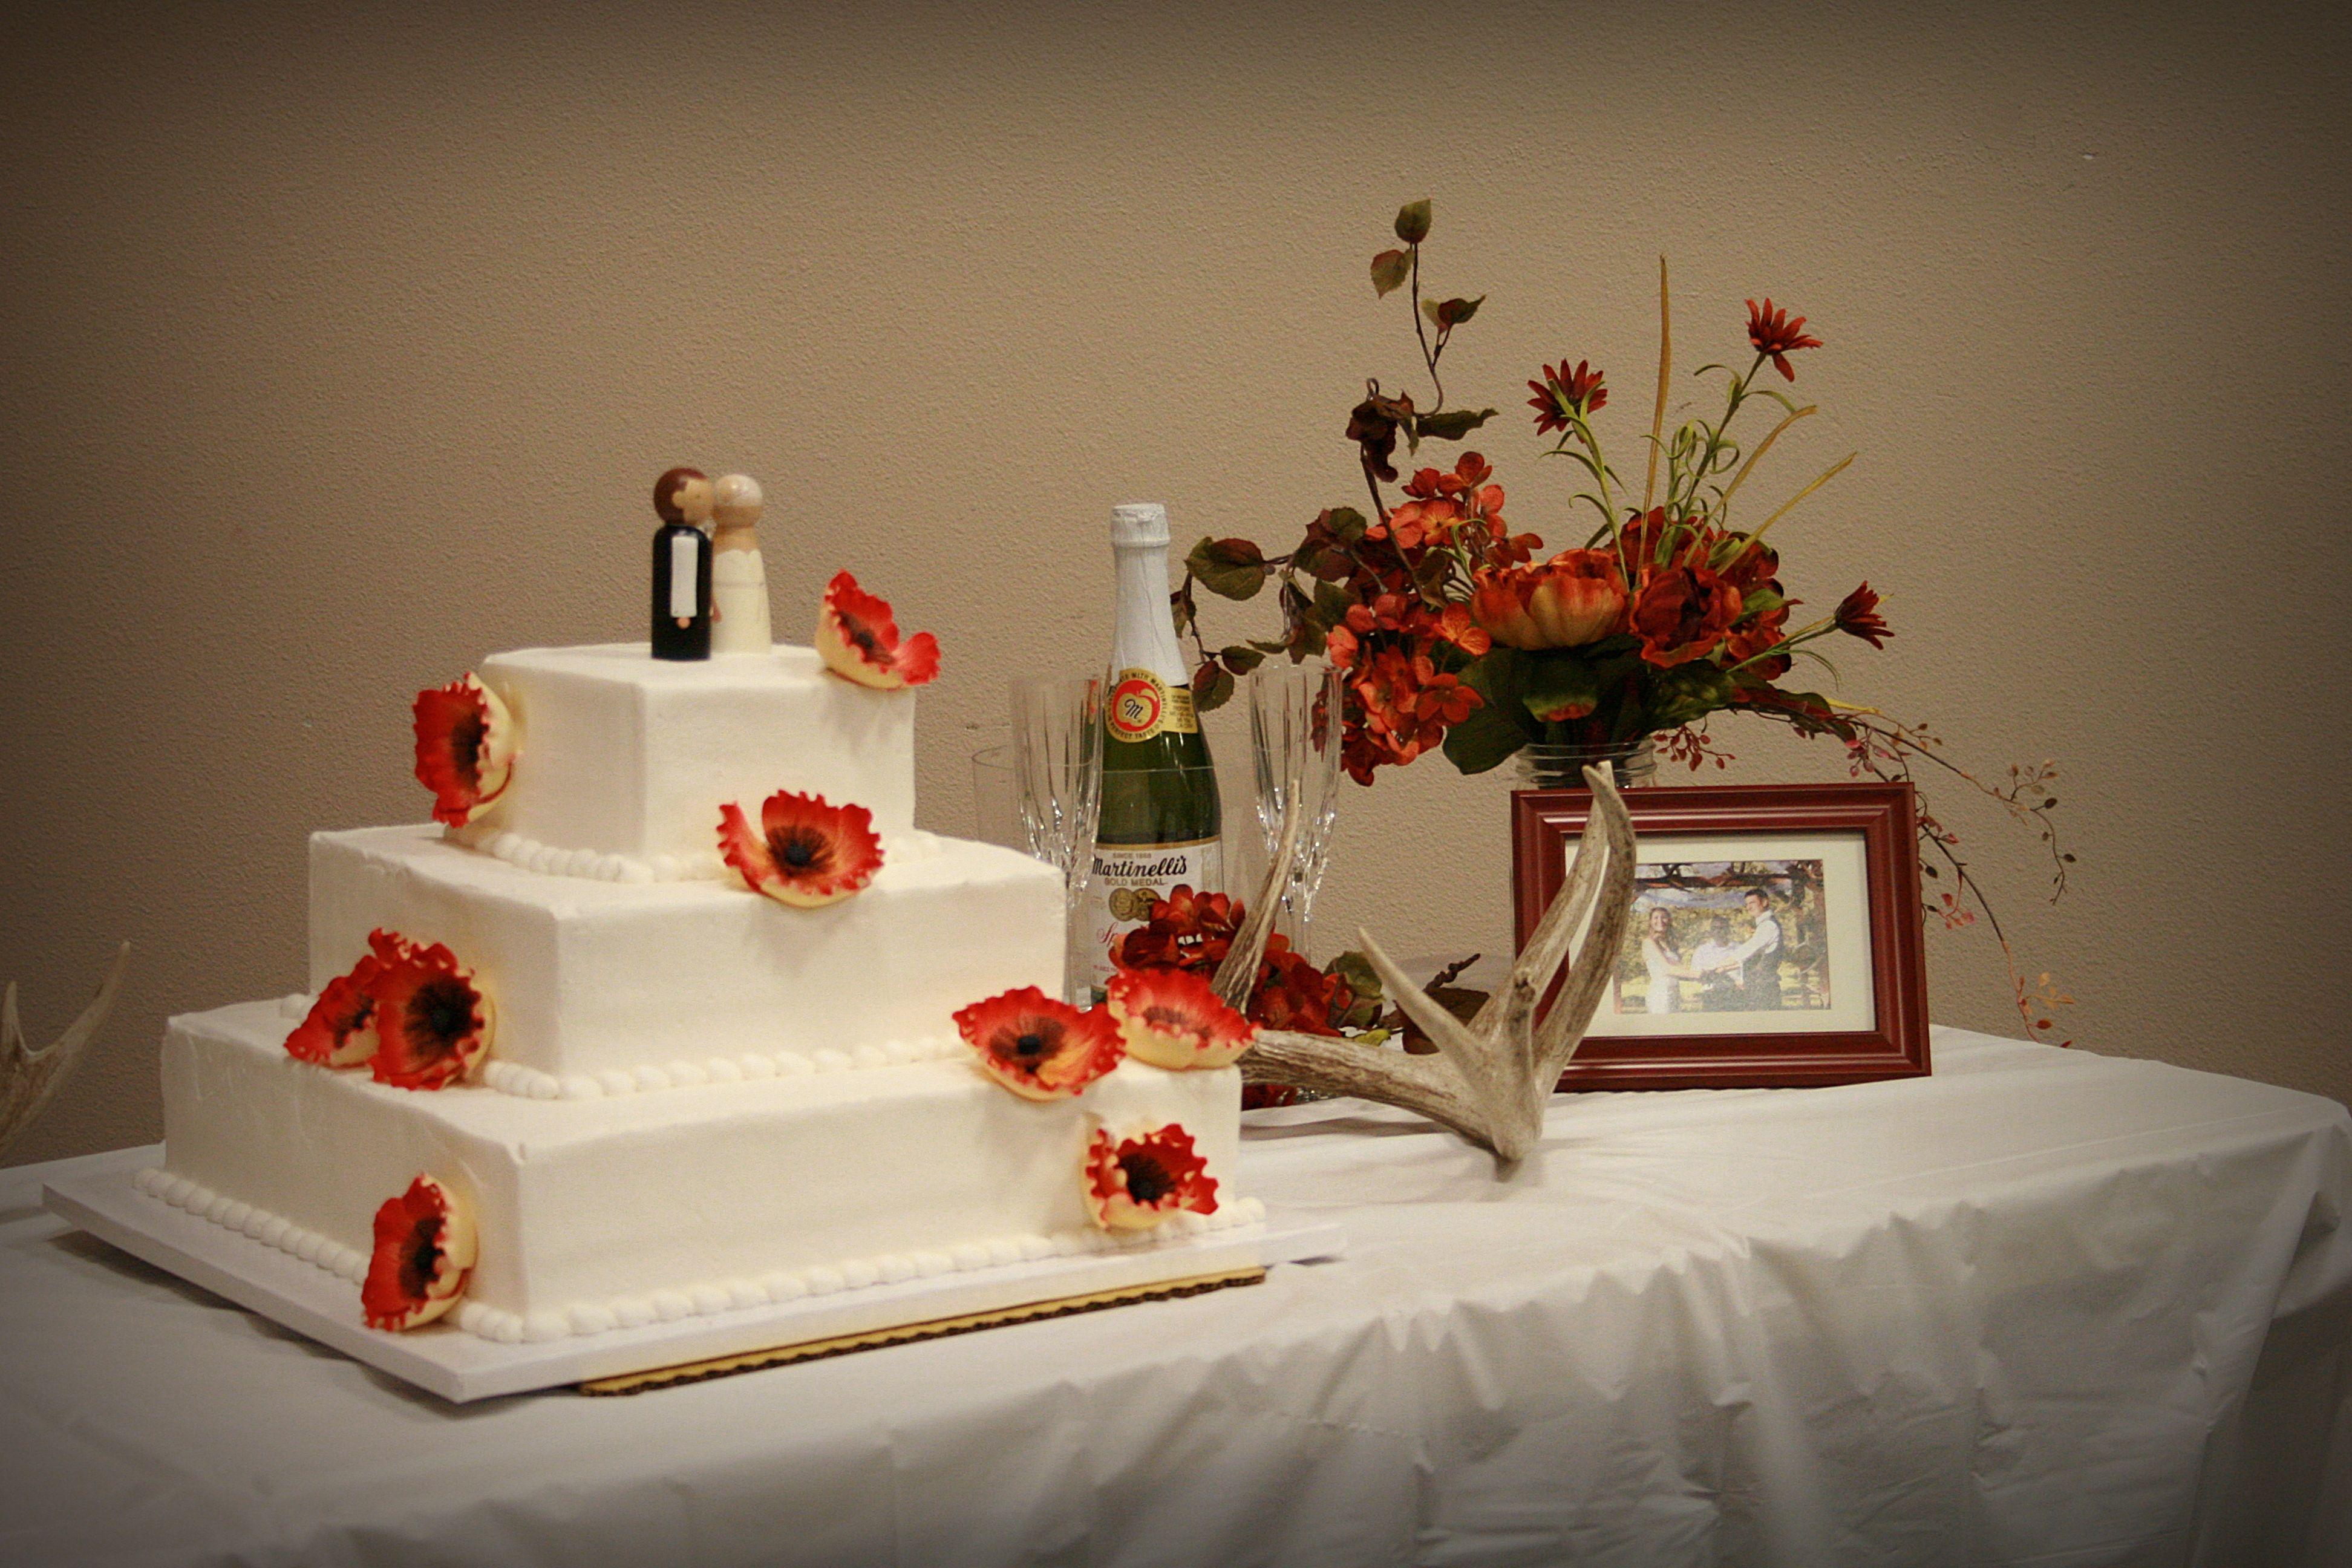 Albertson Wedding Cakes Wedding Cake From Albertsons For My Wedding 2014 Pinterest